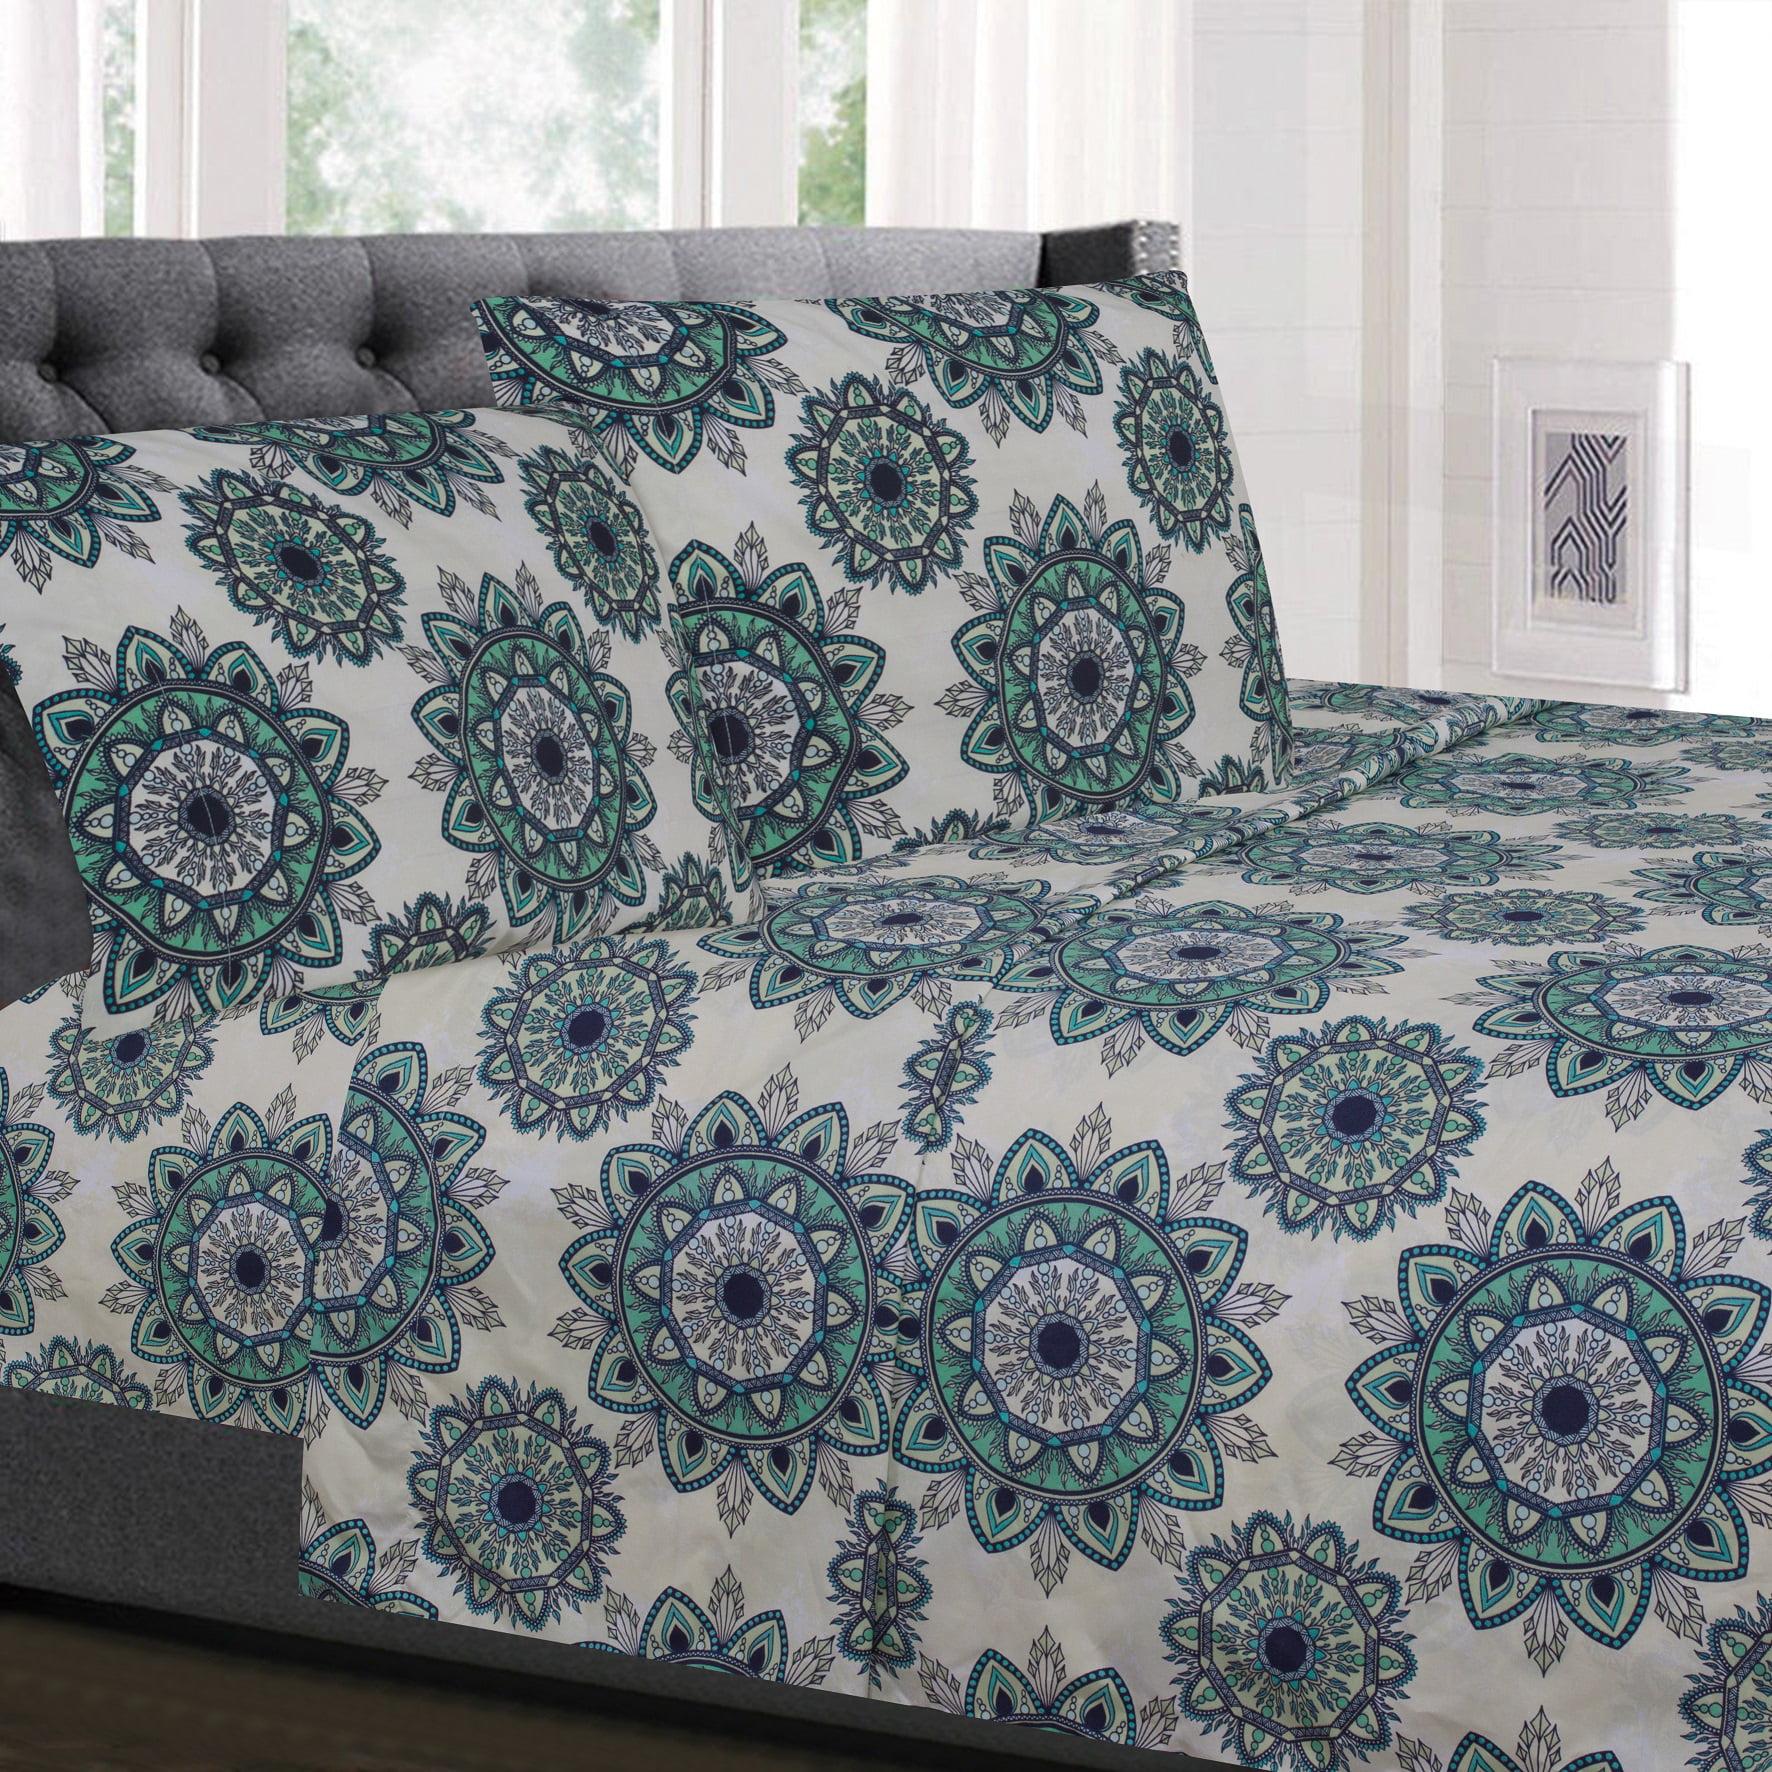 Ashley Green Mandala Pattern 4-Piece 1800 Thread Count Sheet Set